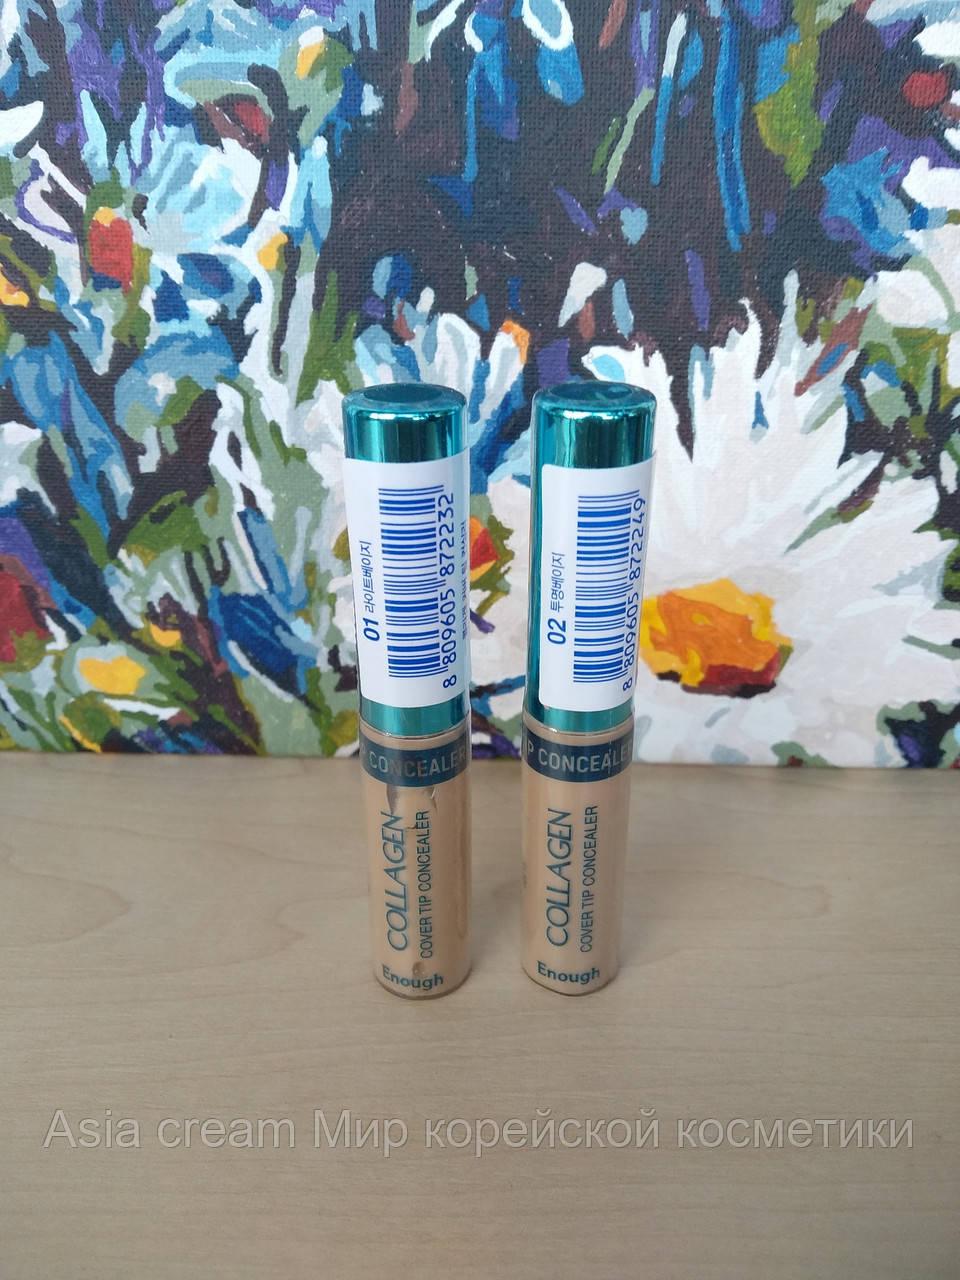 Коллагеновый консилер Enough Collagen Cover Tip Concealer тон 02